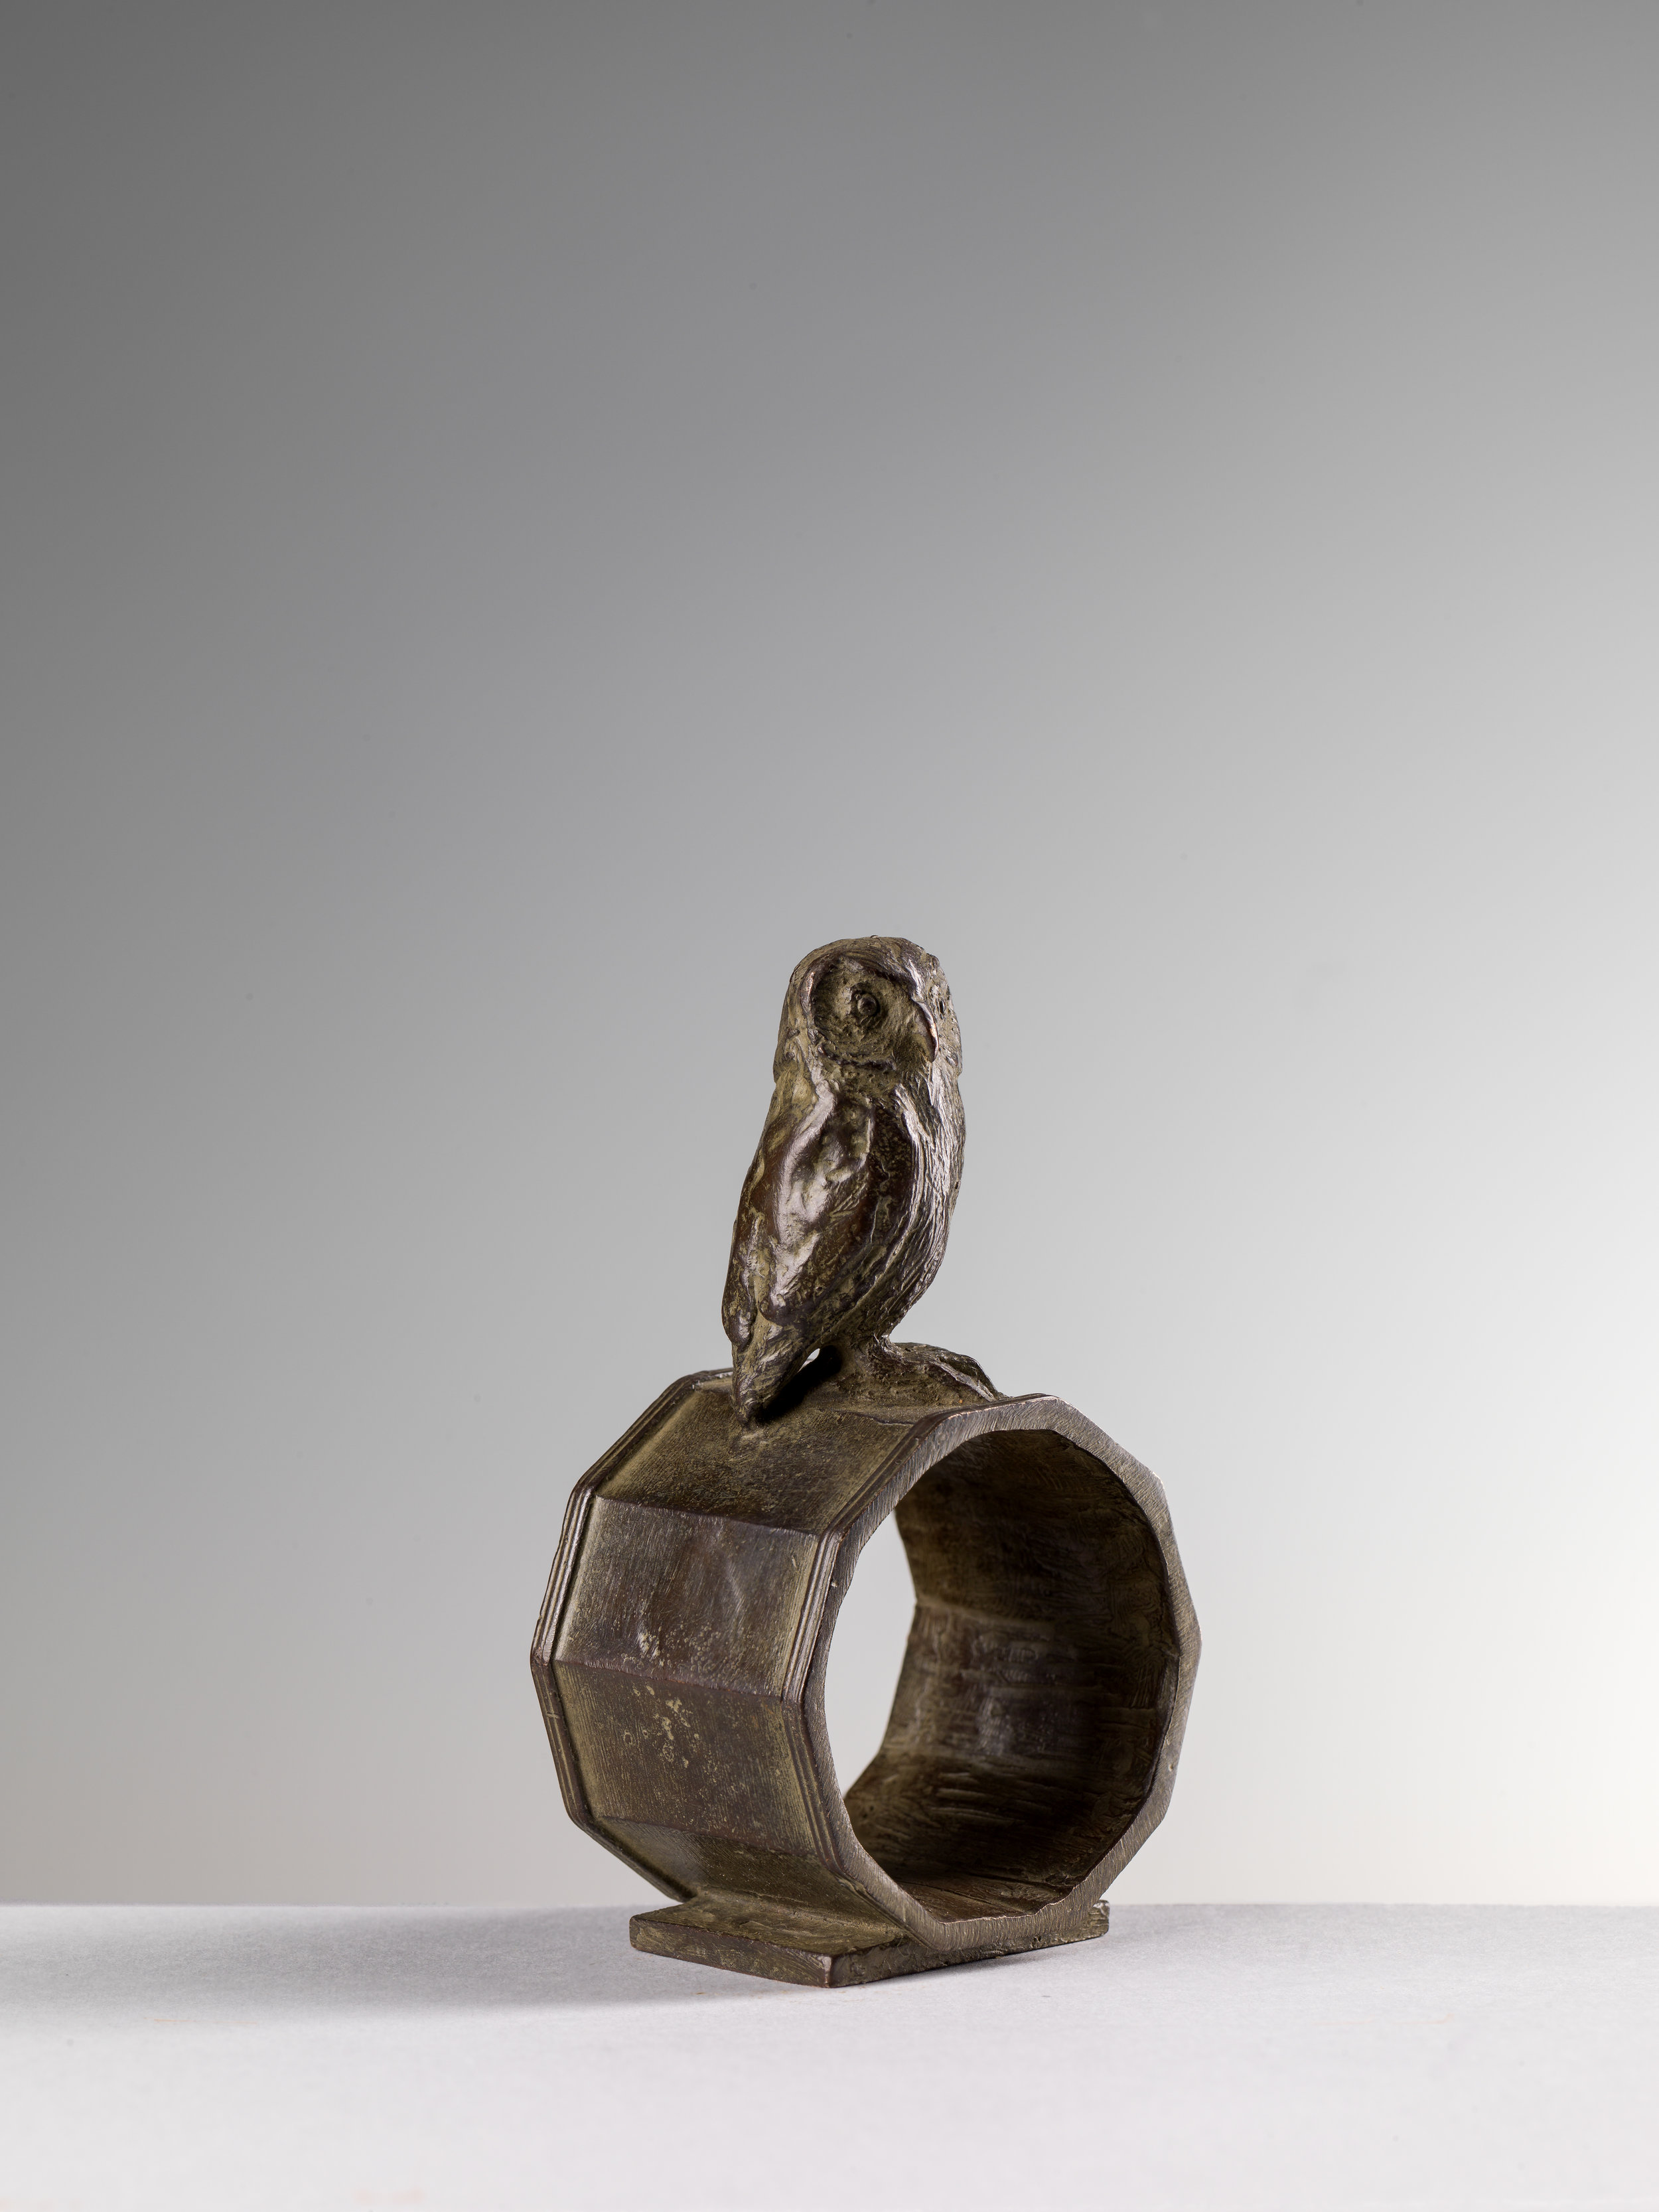 19. Owl Napkin Ring, 'Gufo' by Nicola Lazzari 10cm H x 5cm W x 4cm D.jpg